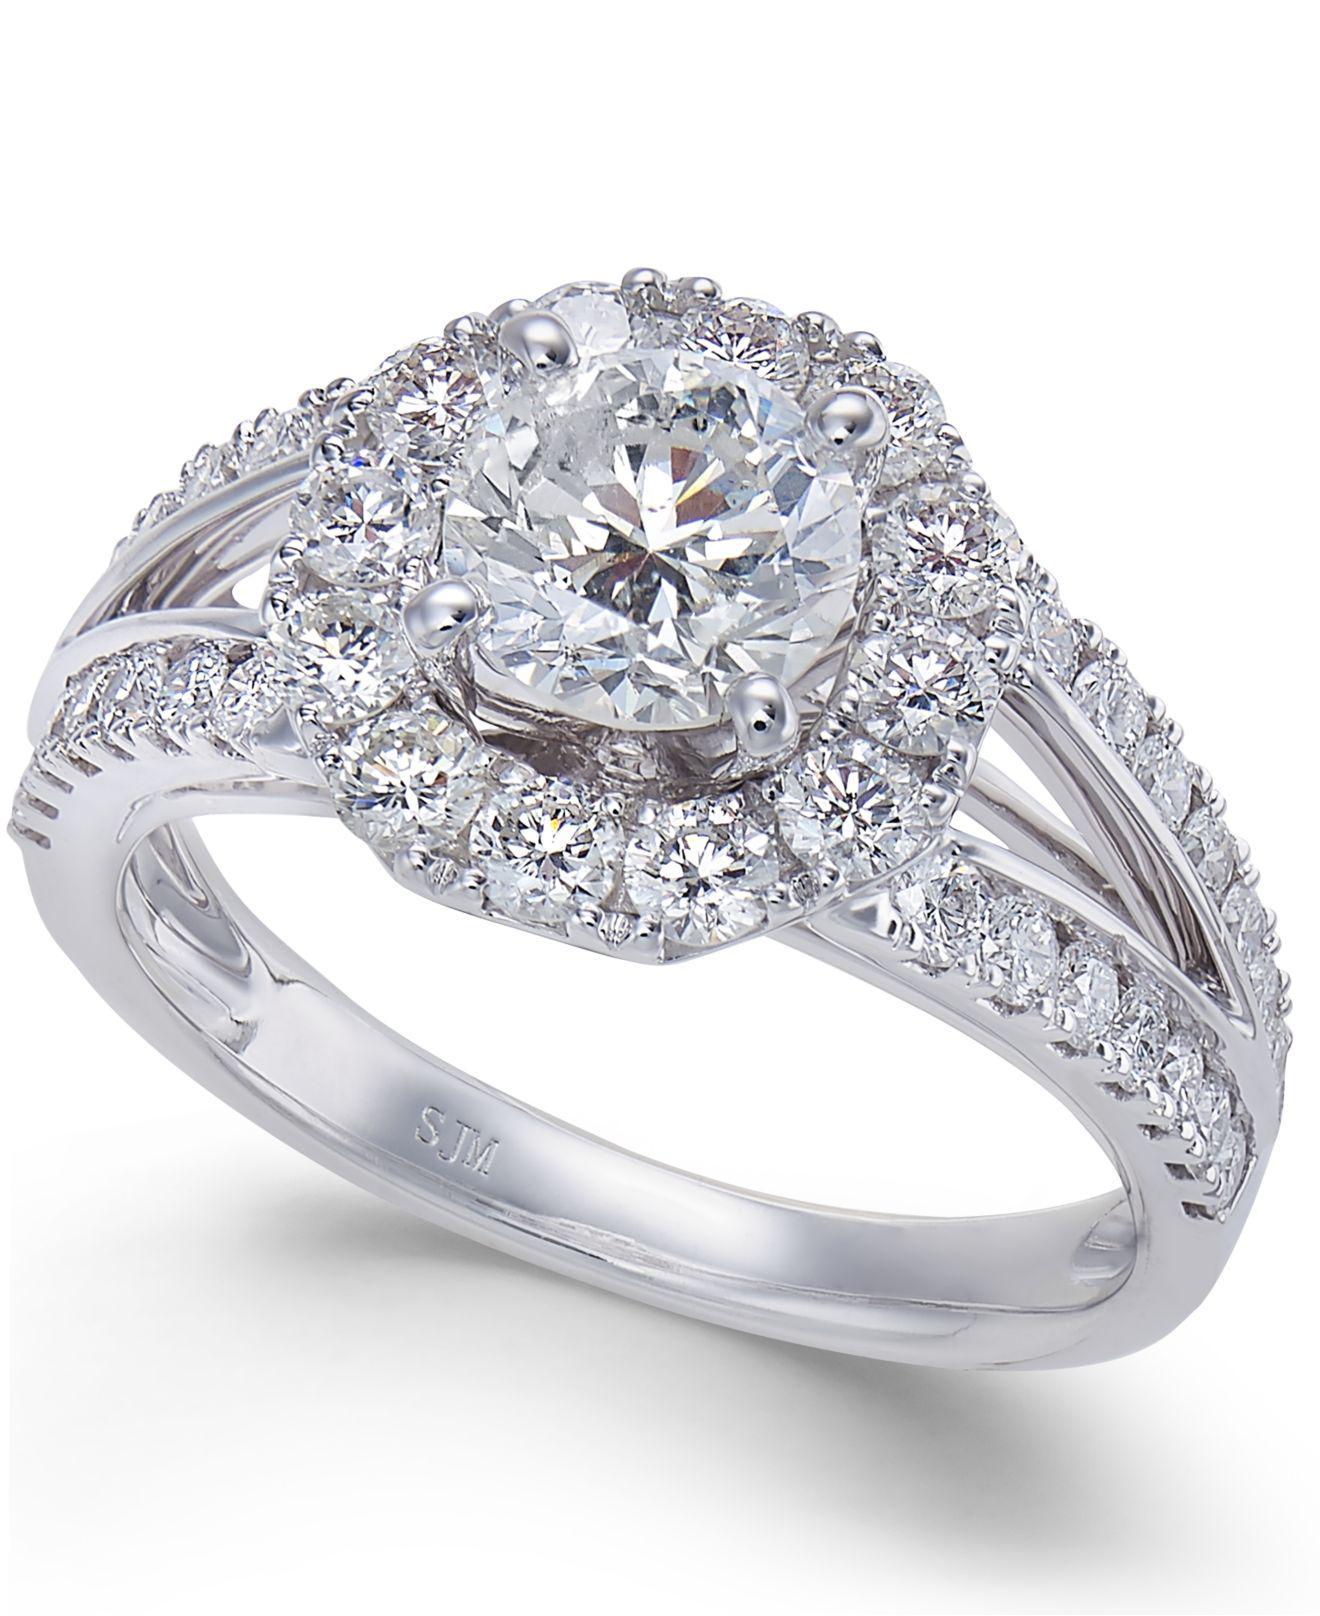 Macys Mens Wedding Rings: Macy's Diamond Halo Engagement Ring (2 Ct. T.w.) In 14k